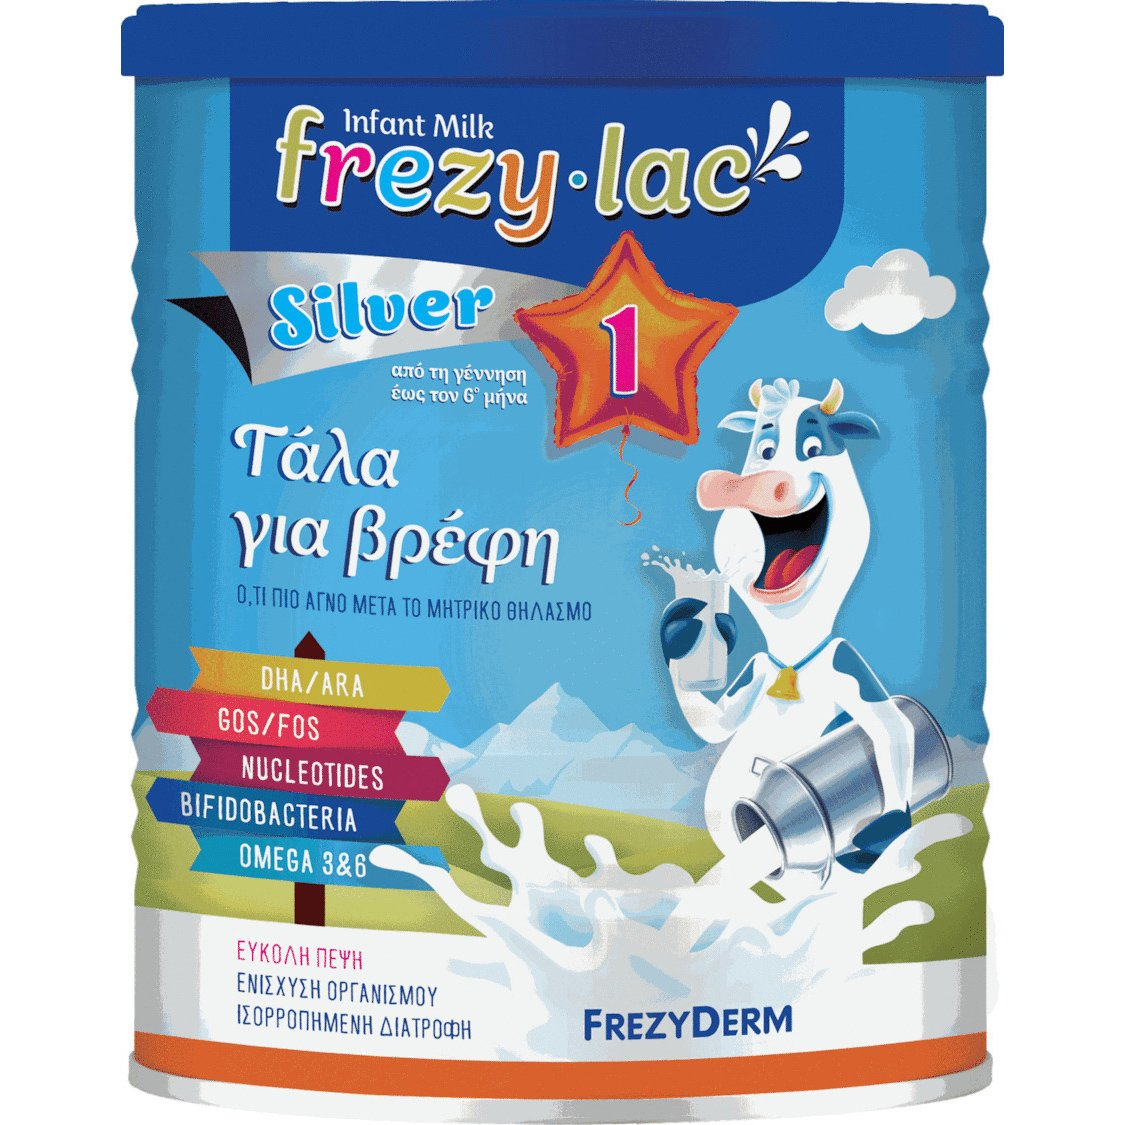 Frezyderm Frezylac Silver 1 Αγελαδινό Γάλα 1ης Βρεφικής Ηλικίας από την Γέννηση Έως τον 6ο Μήνα 400gr